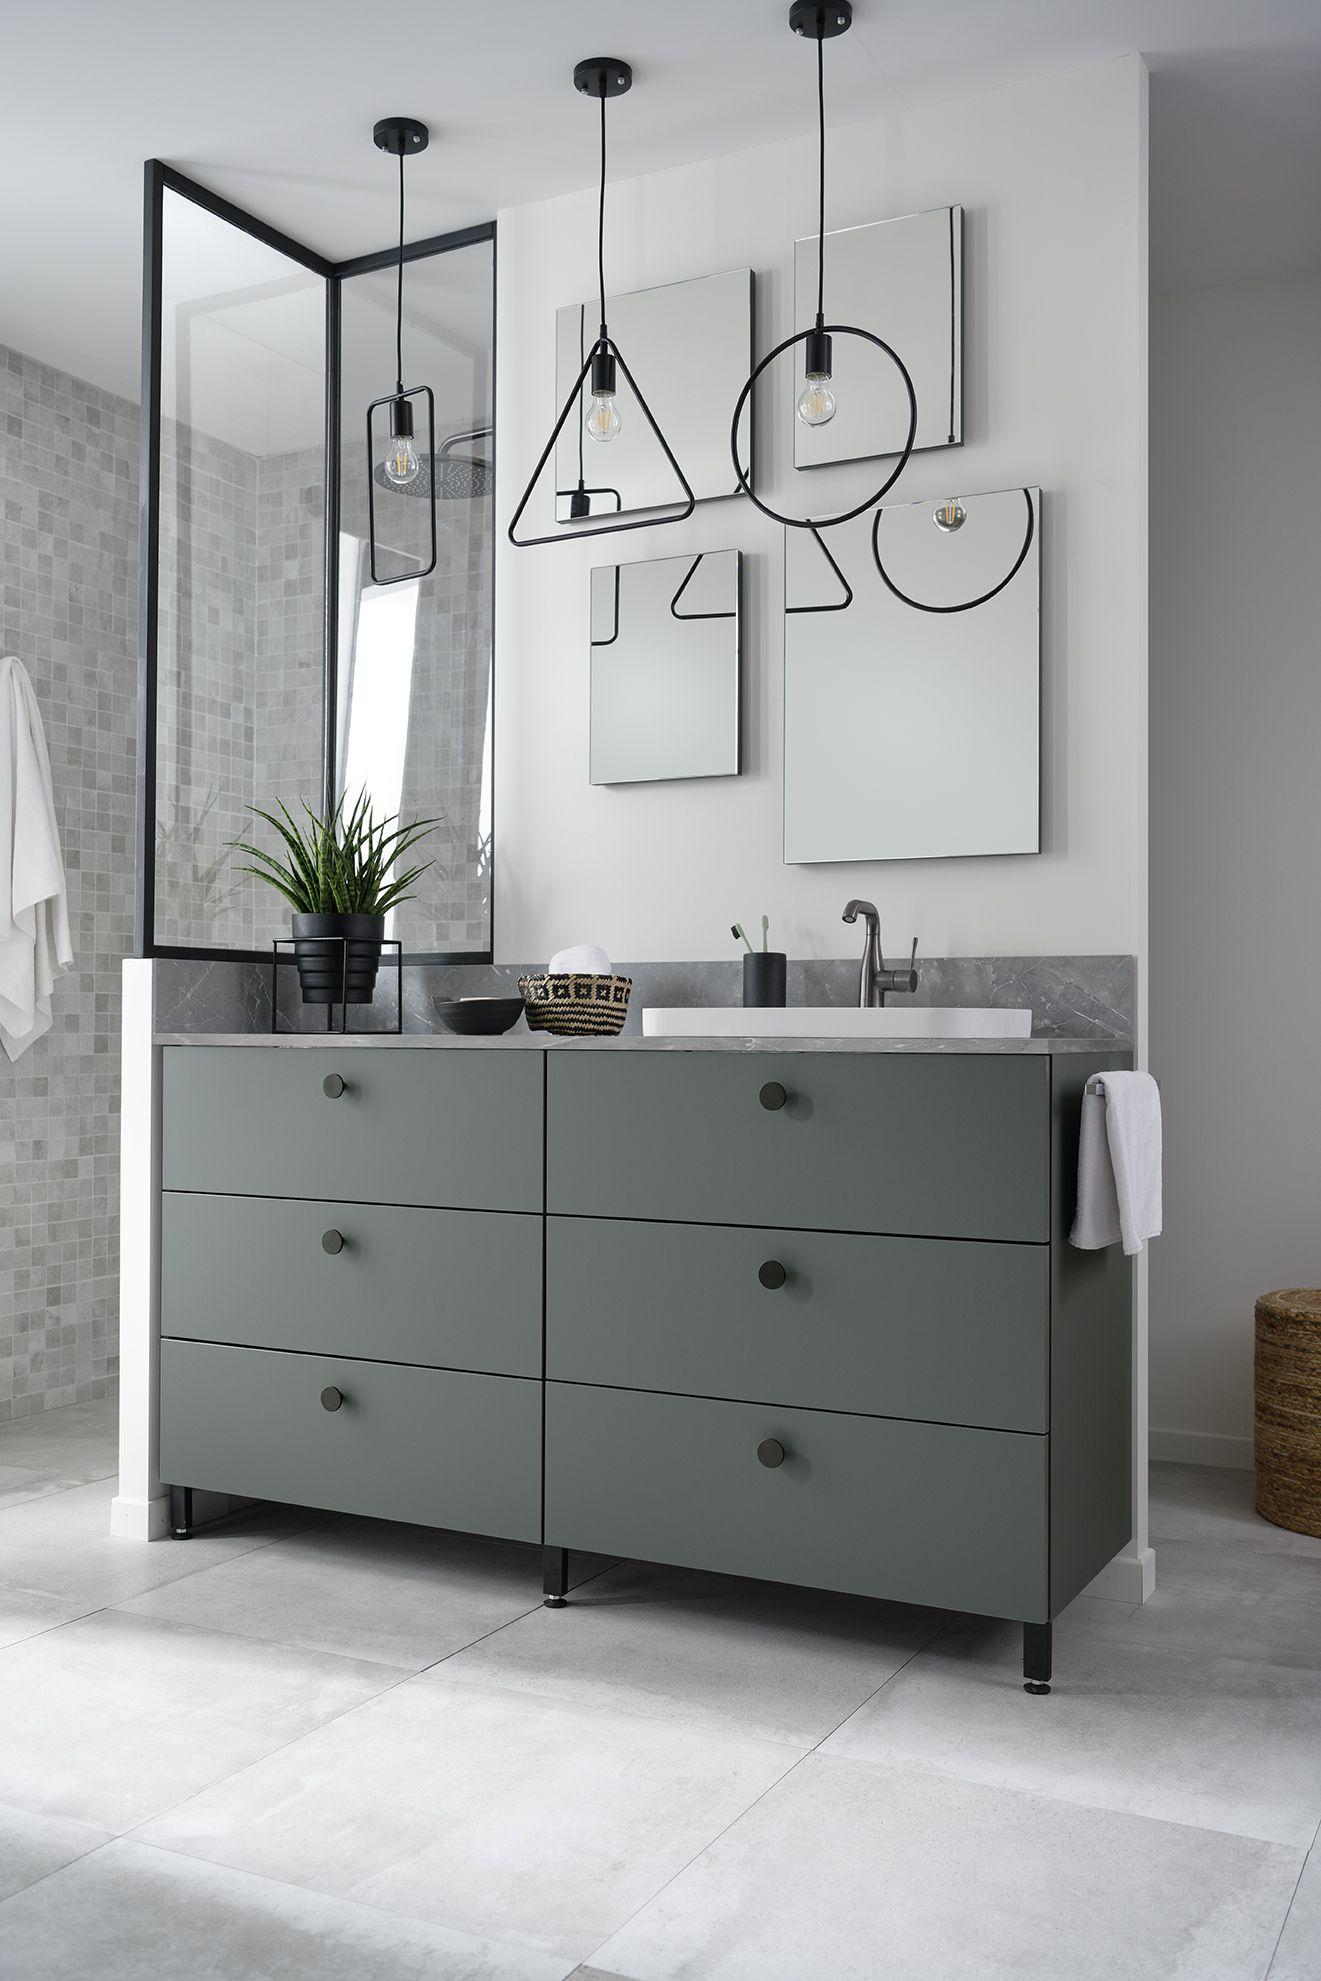 Vanity Unit in 11  Bespoke bathroom, Bathroom design, Made to